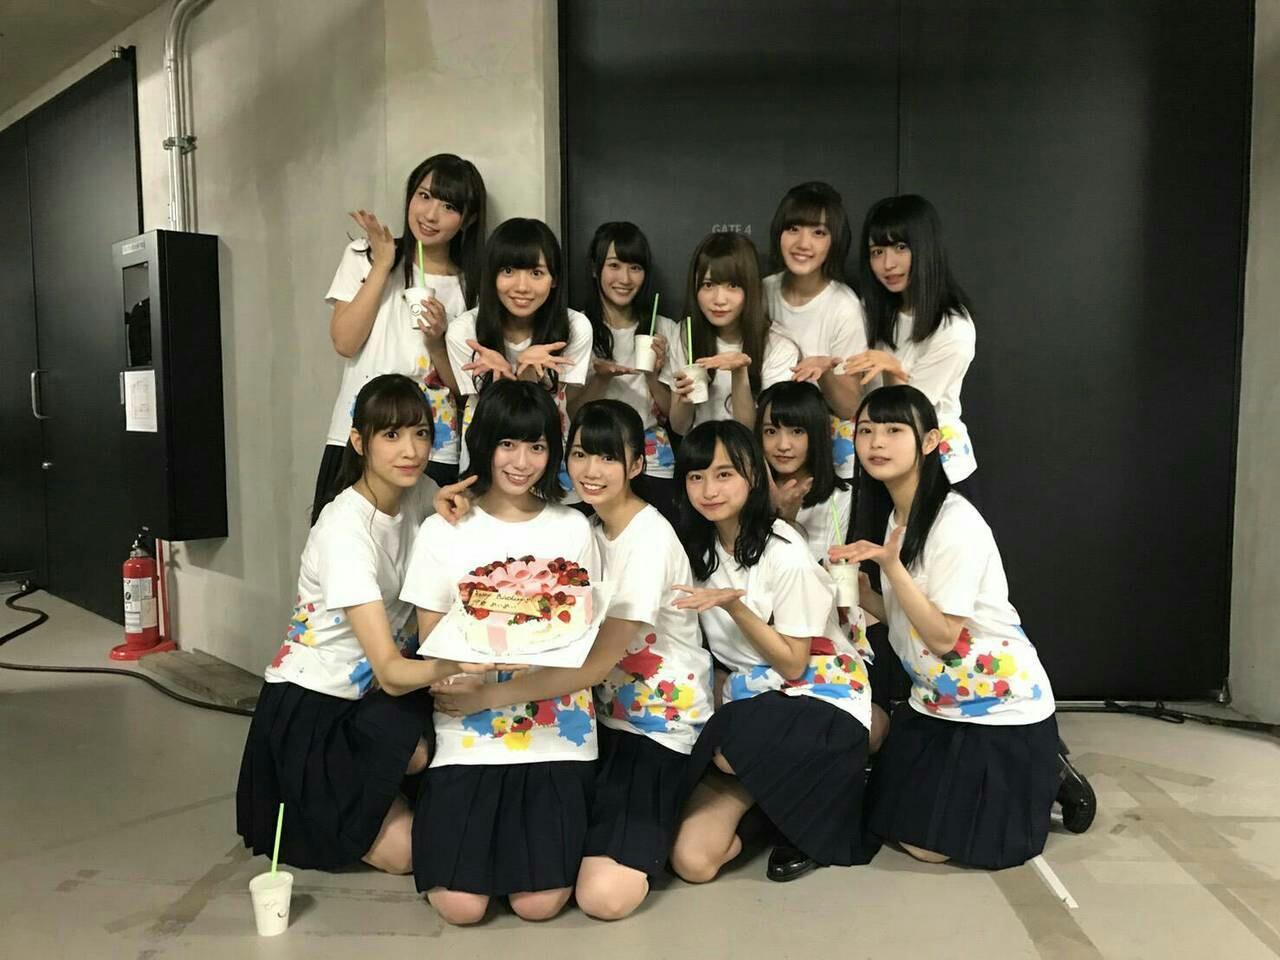 f:id:asitaha46:20170825000743j:image